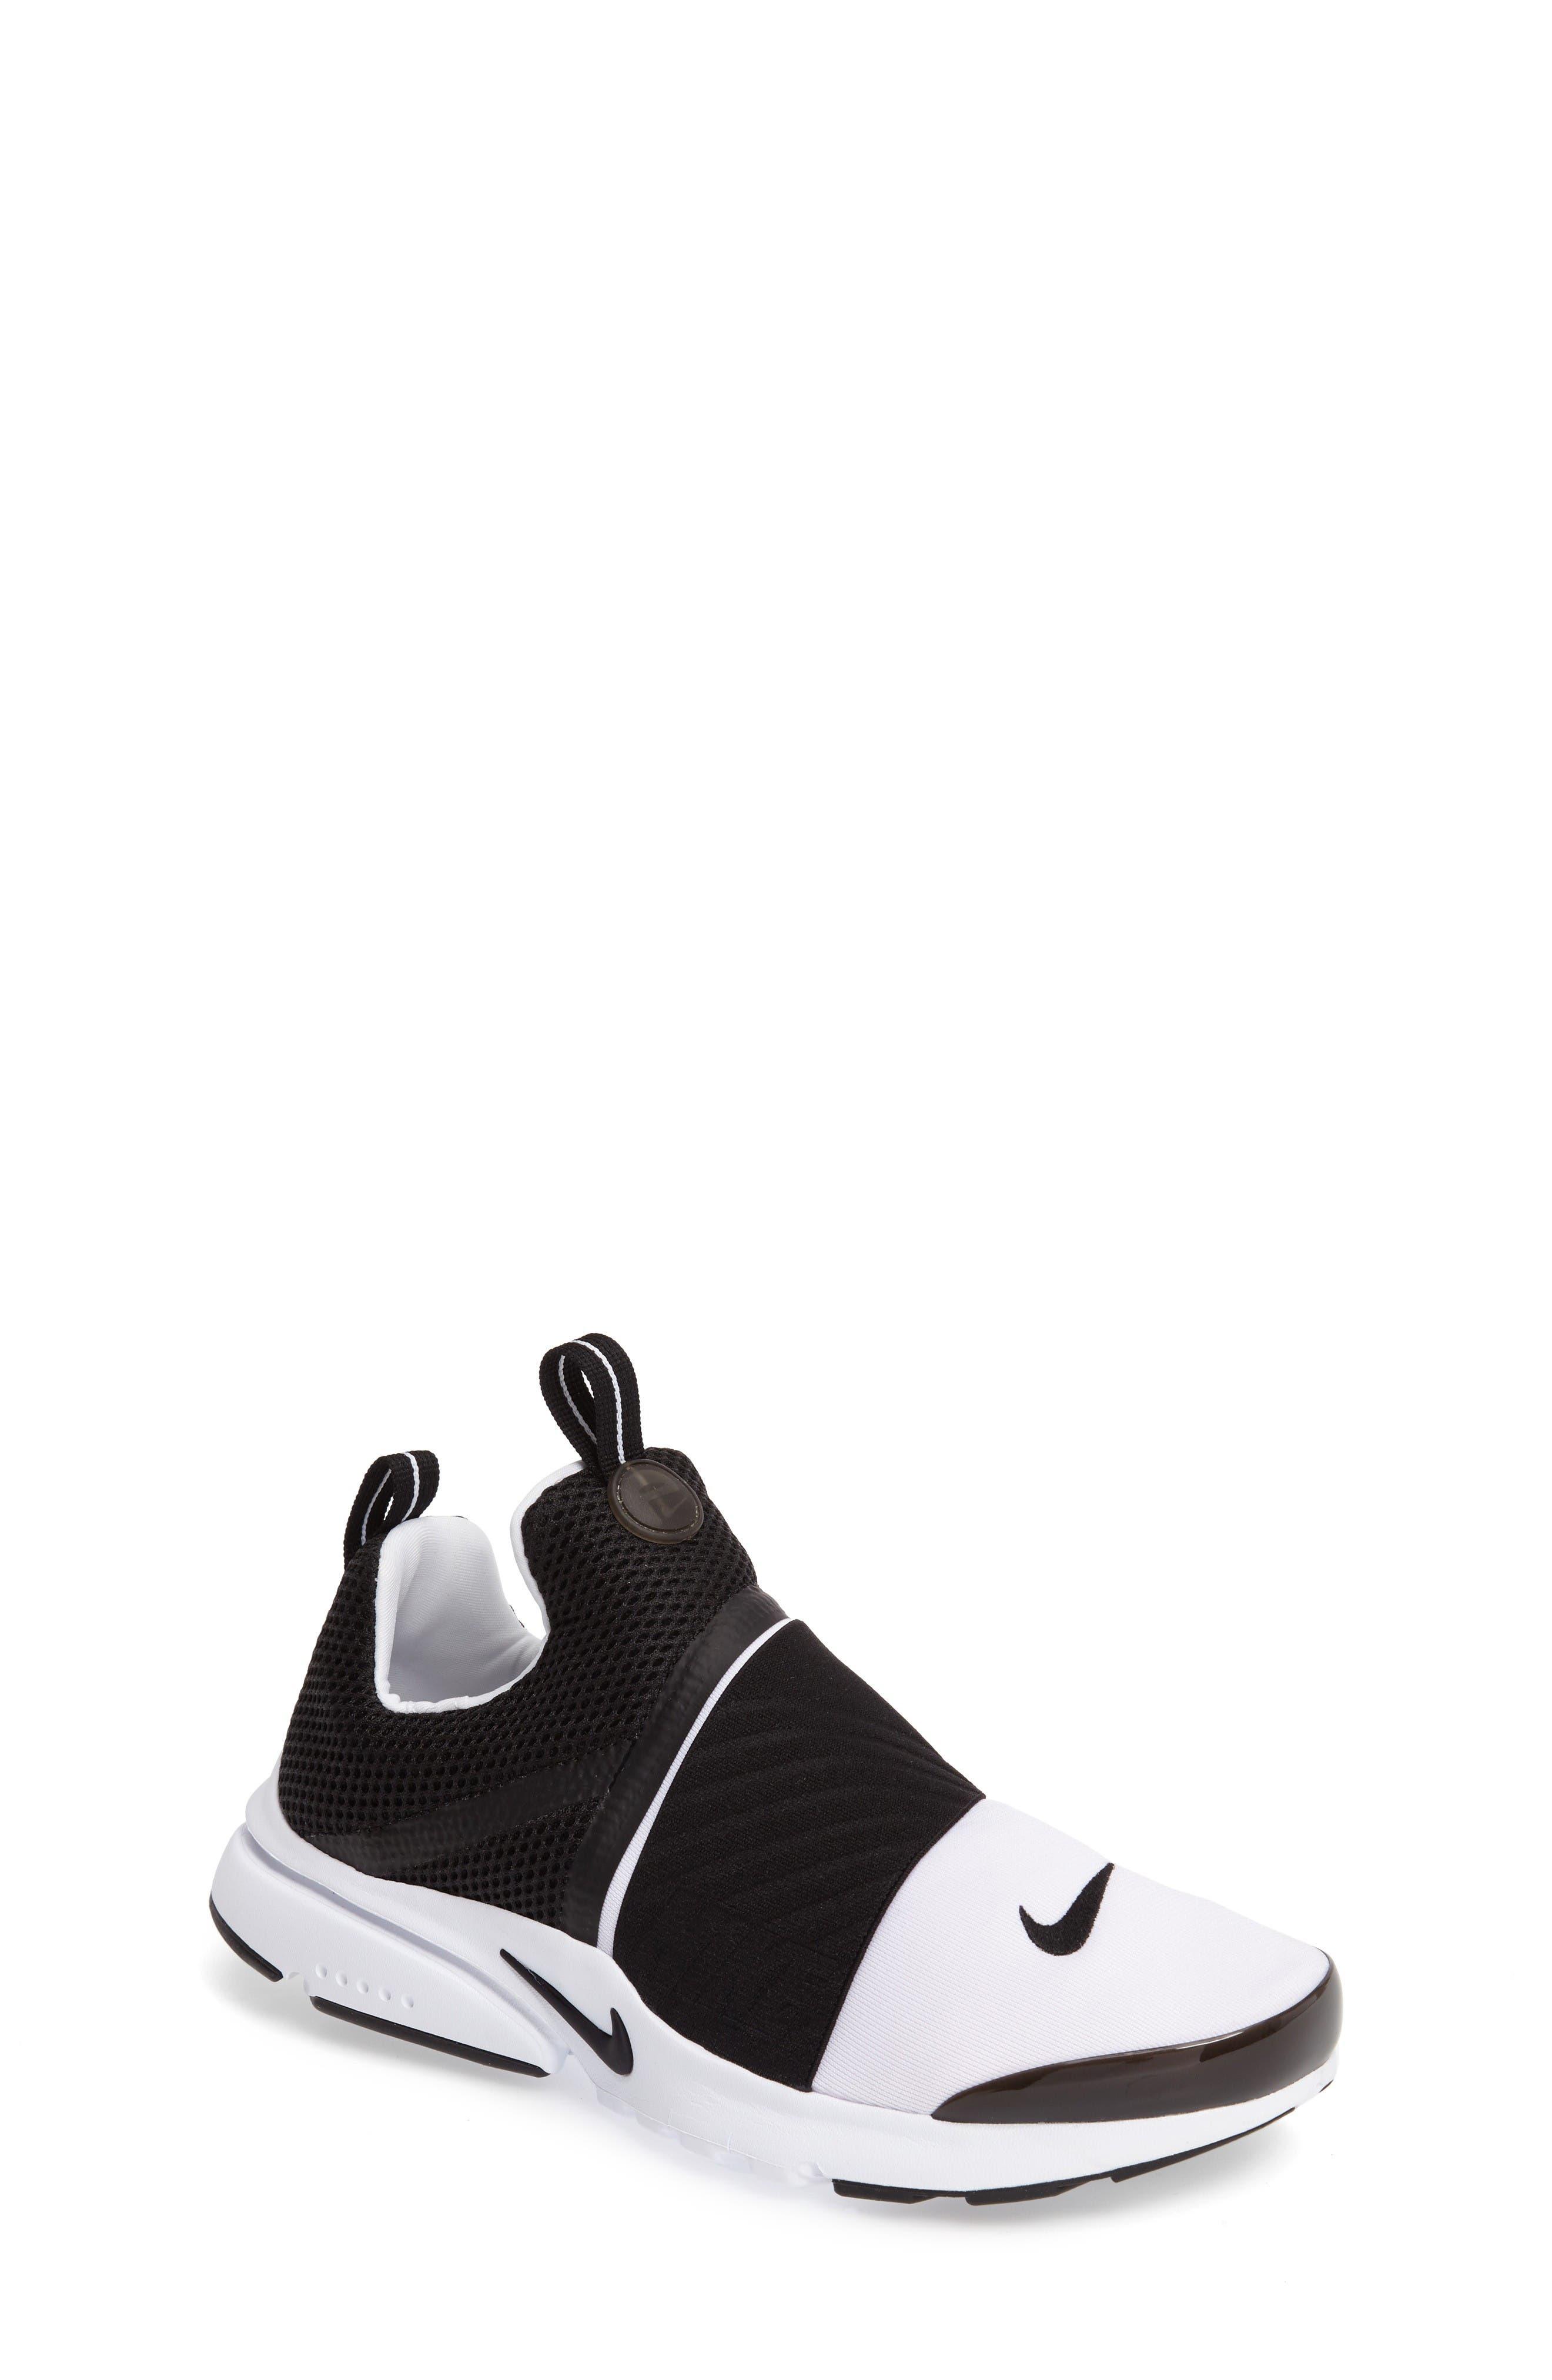 Main Image - Nike Presto Extreme Sneaker (Walker, Toddler, Little Kid & Big Kid)